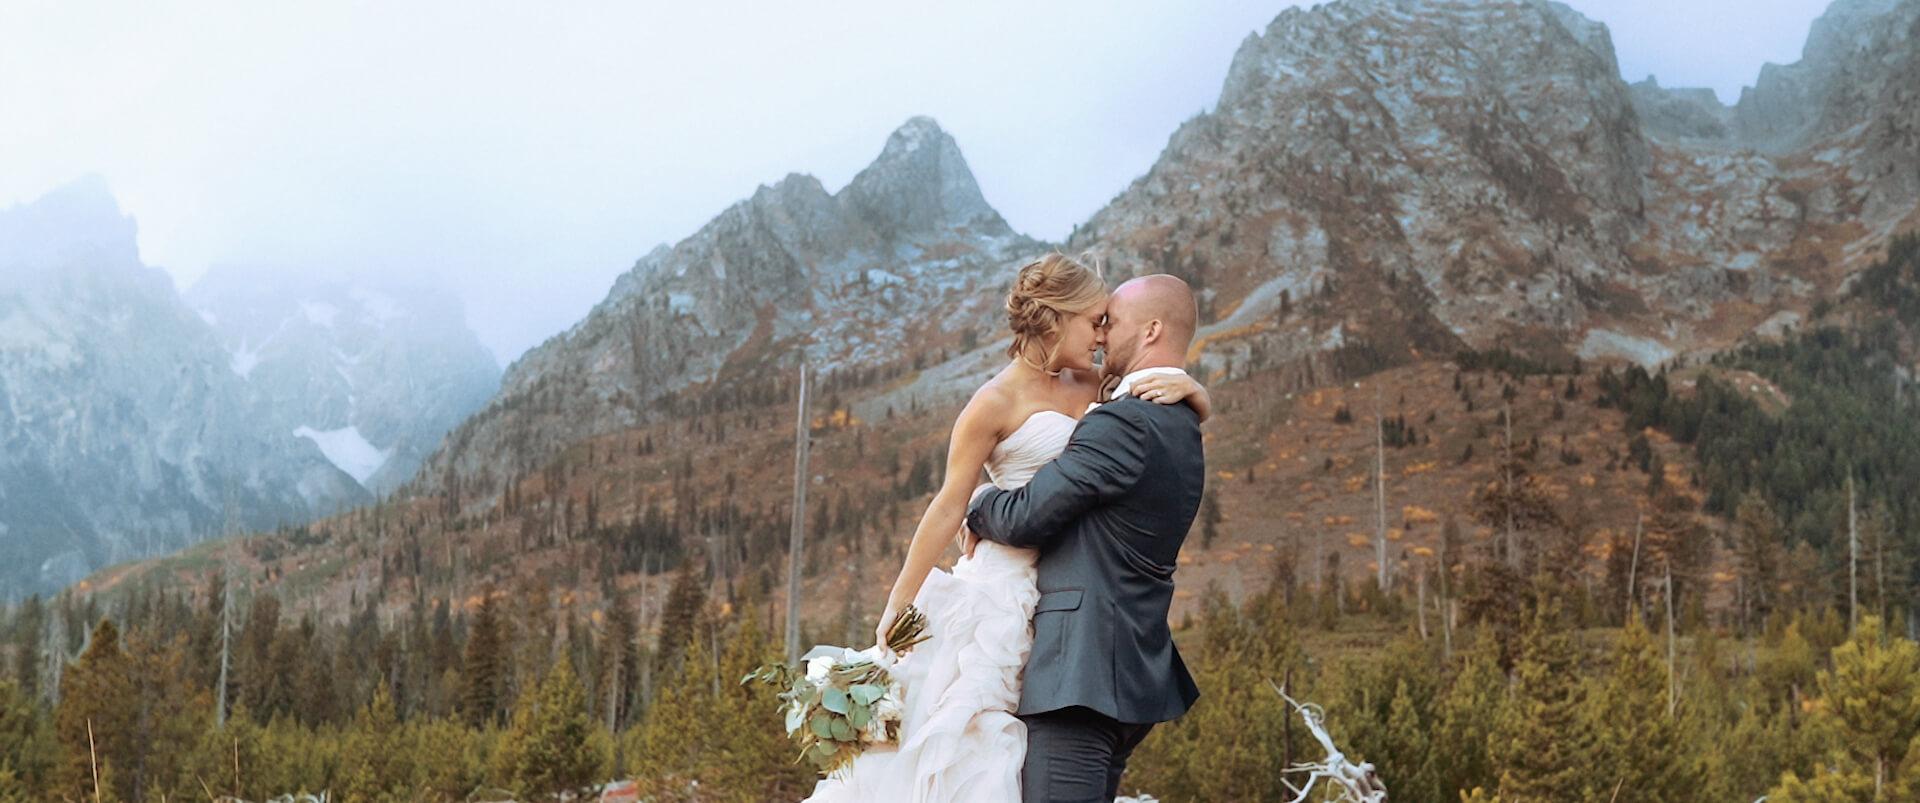 Sam + Brittany | Wyoming, Wyoming | Grand Tetons National Park